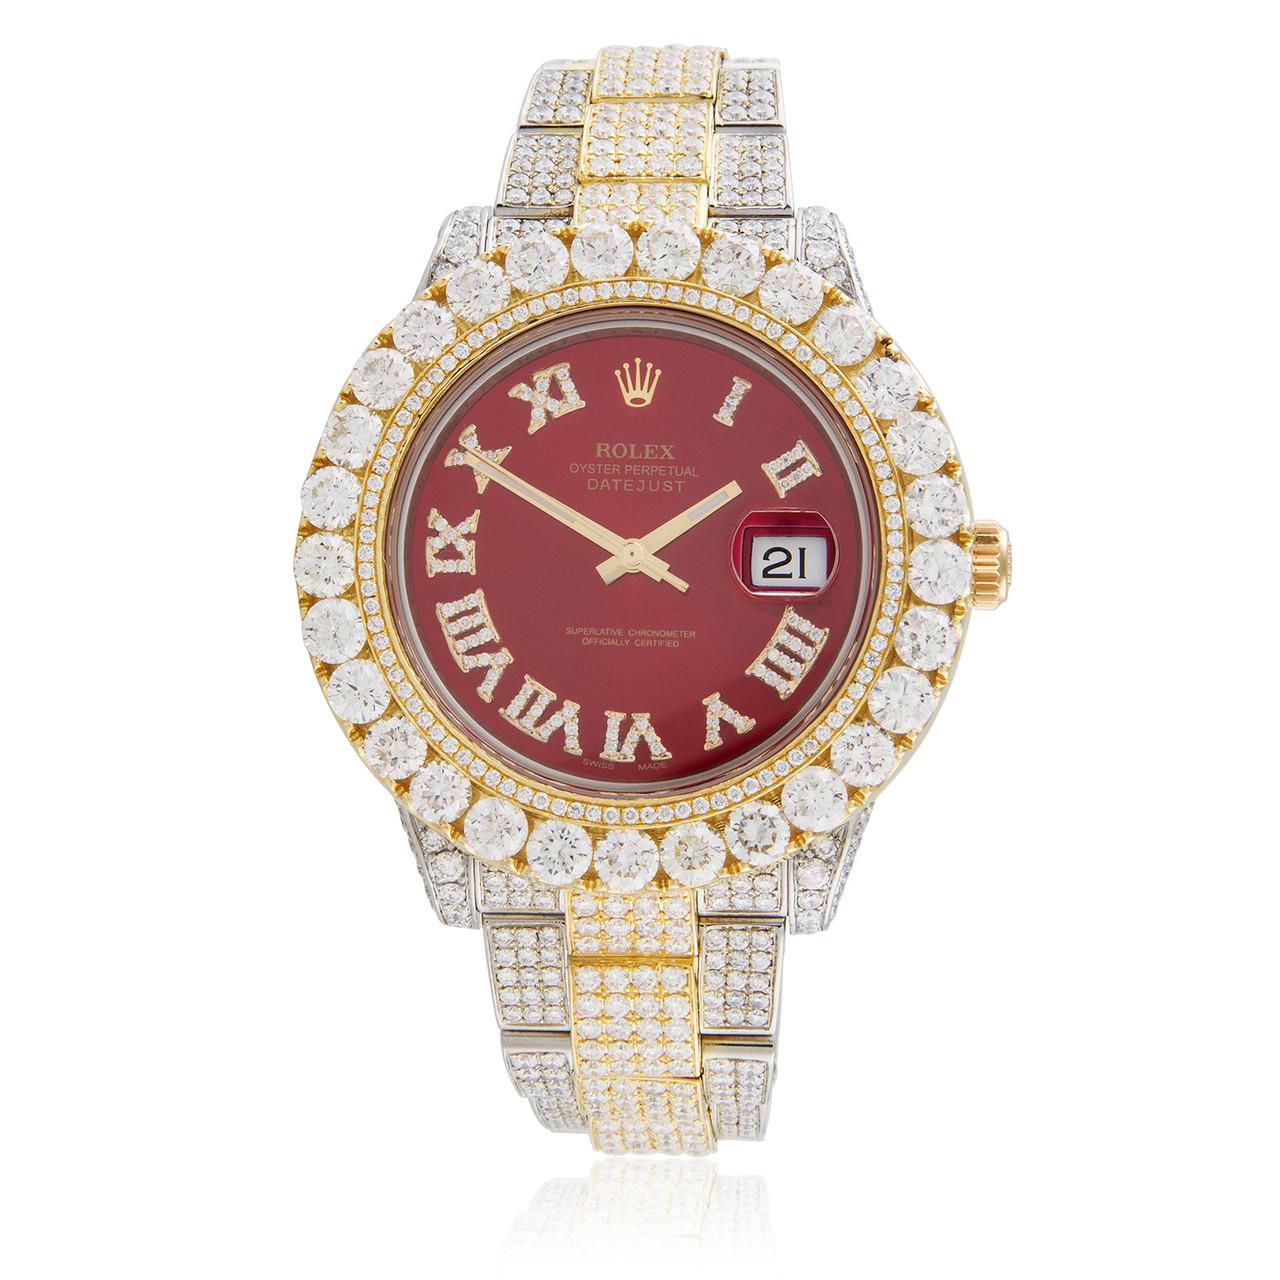 2ebe64a0b Rolex DateJust 18K Yellow Gold 29ct Diamond Automatic Men's Watch - Shyne  Jewelers